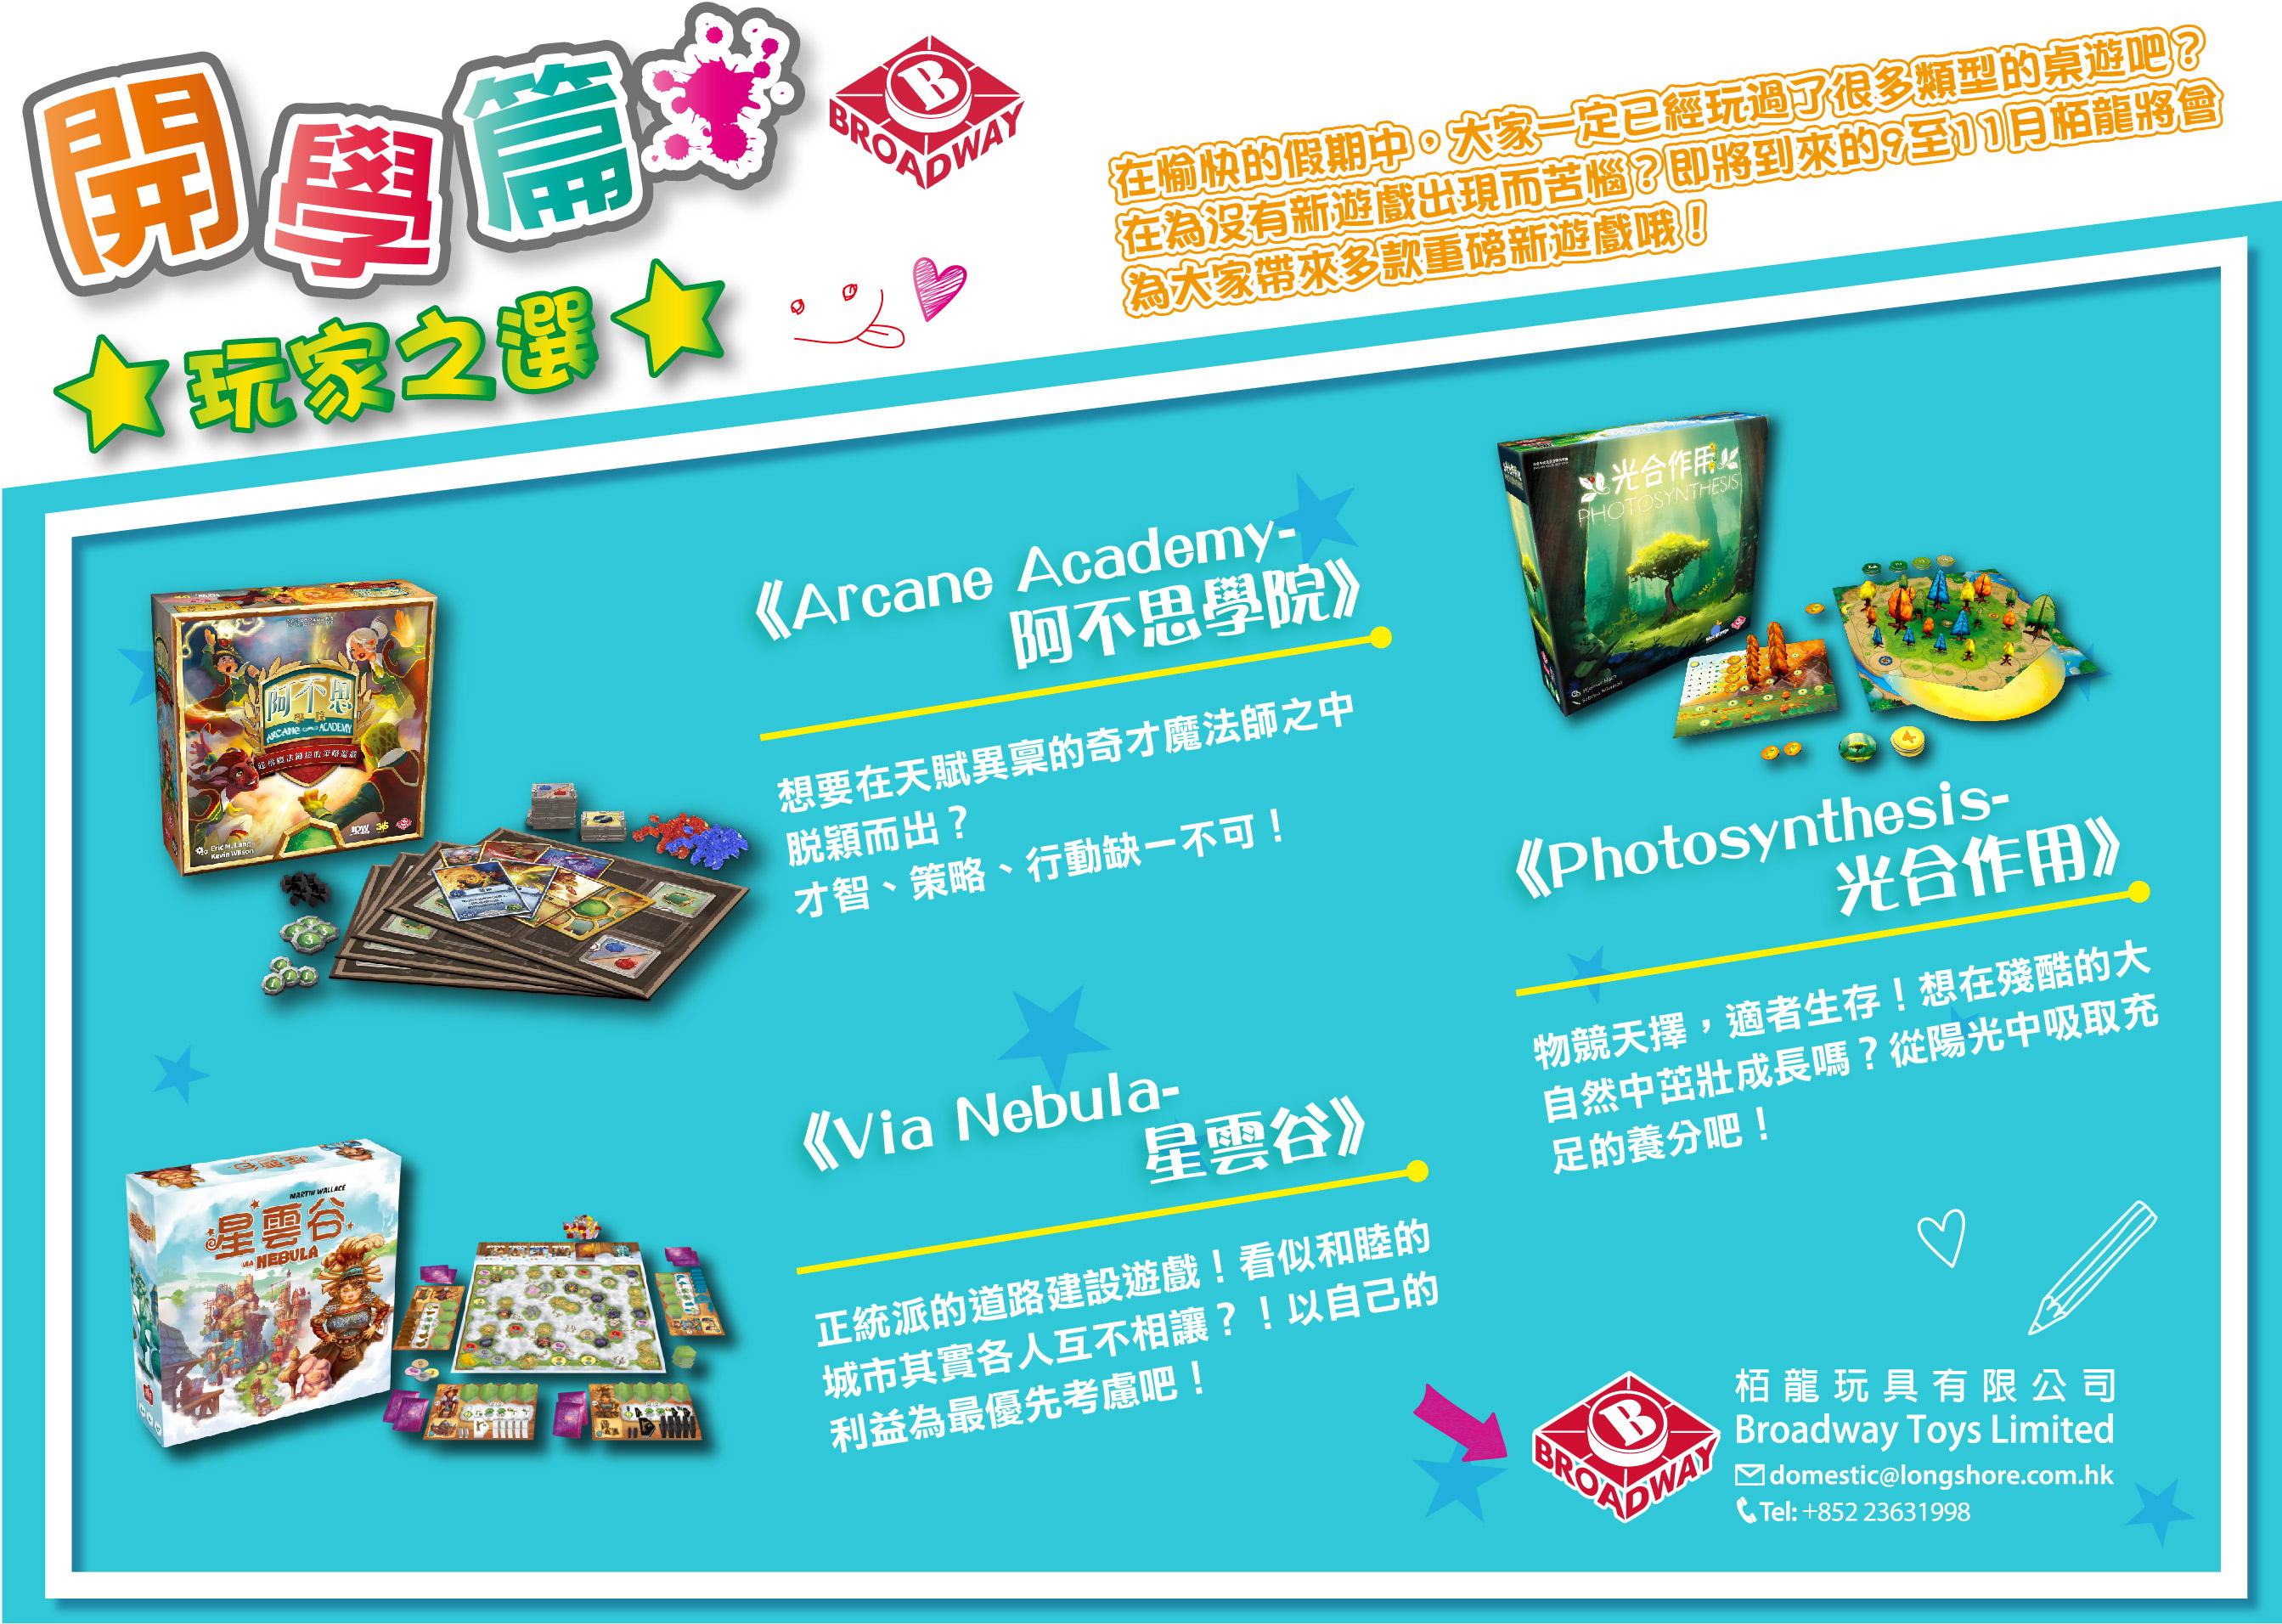 http://broadwaygames.com.hk/wp-content/uploads/2017/09/玩家之選2-01-2.jpg